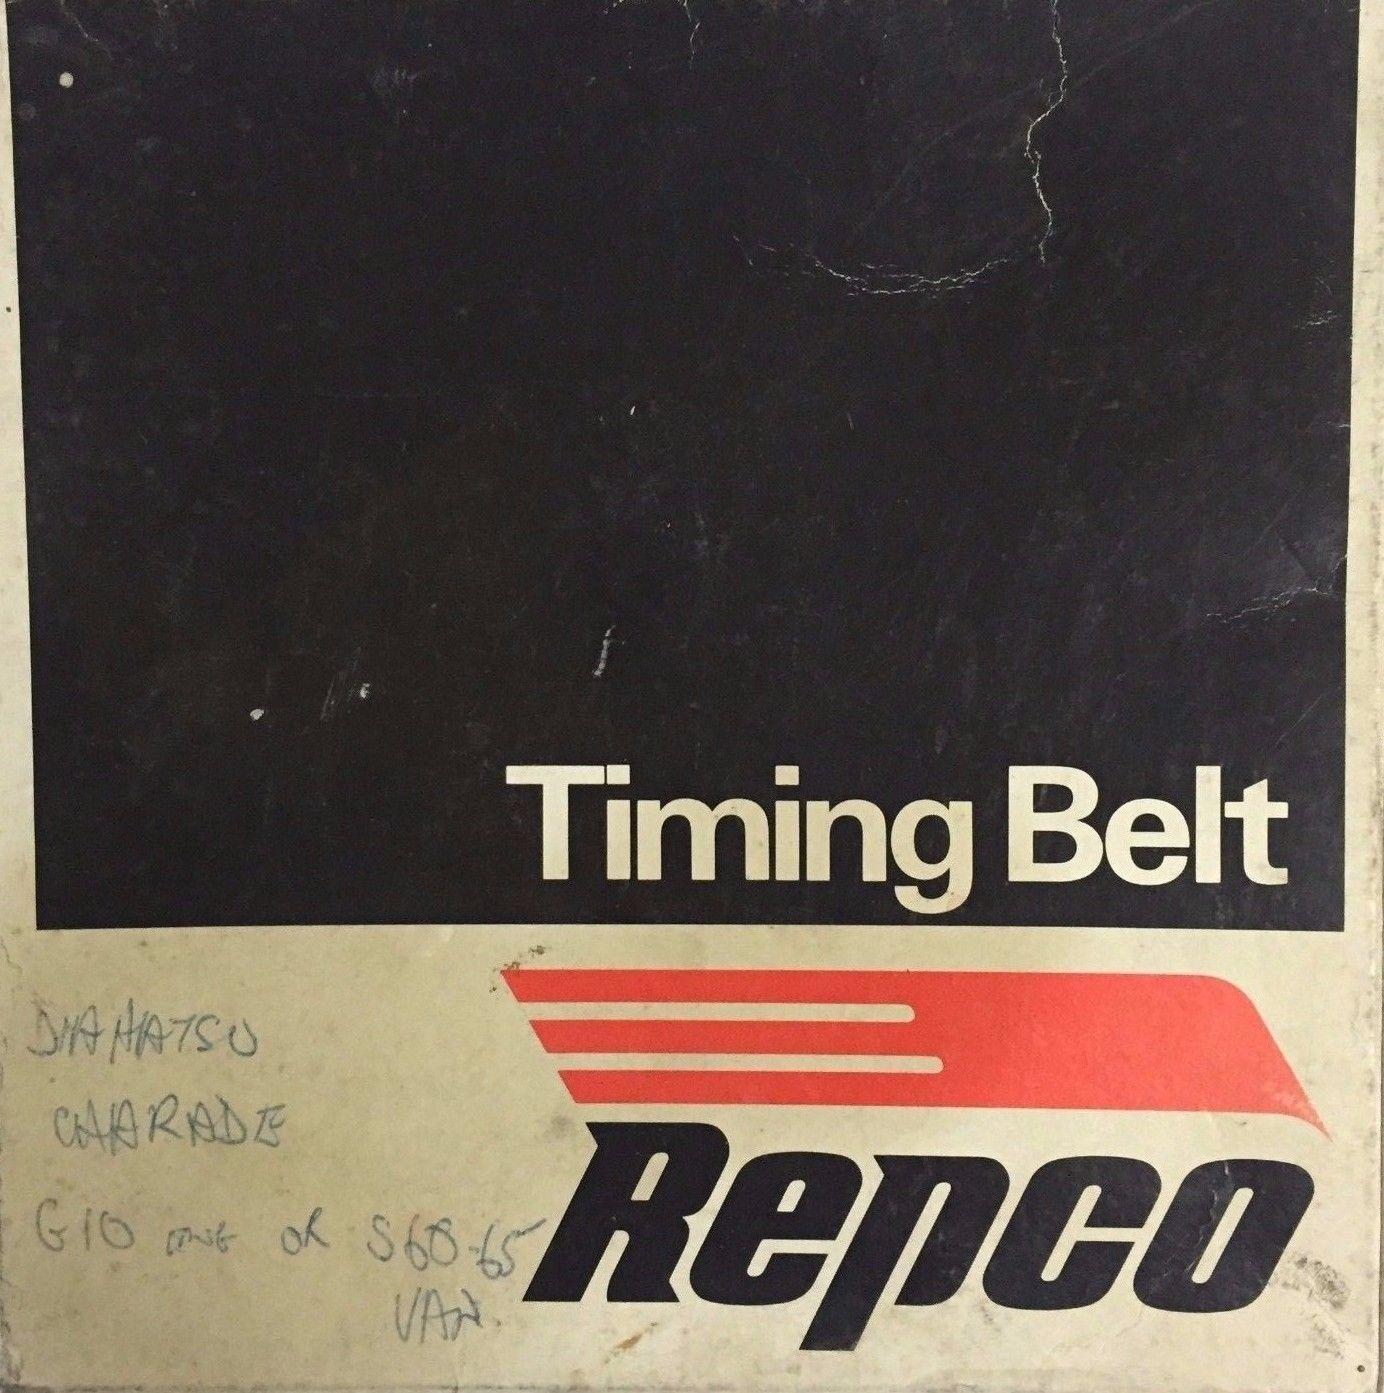 hight resolution of daihatsu charade handivan hi jet s60v s65 van timing belt timing belt t803 repco